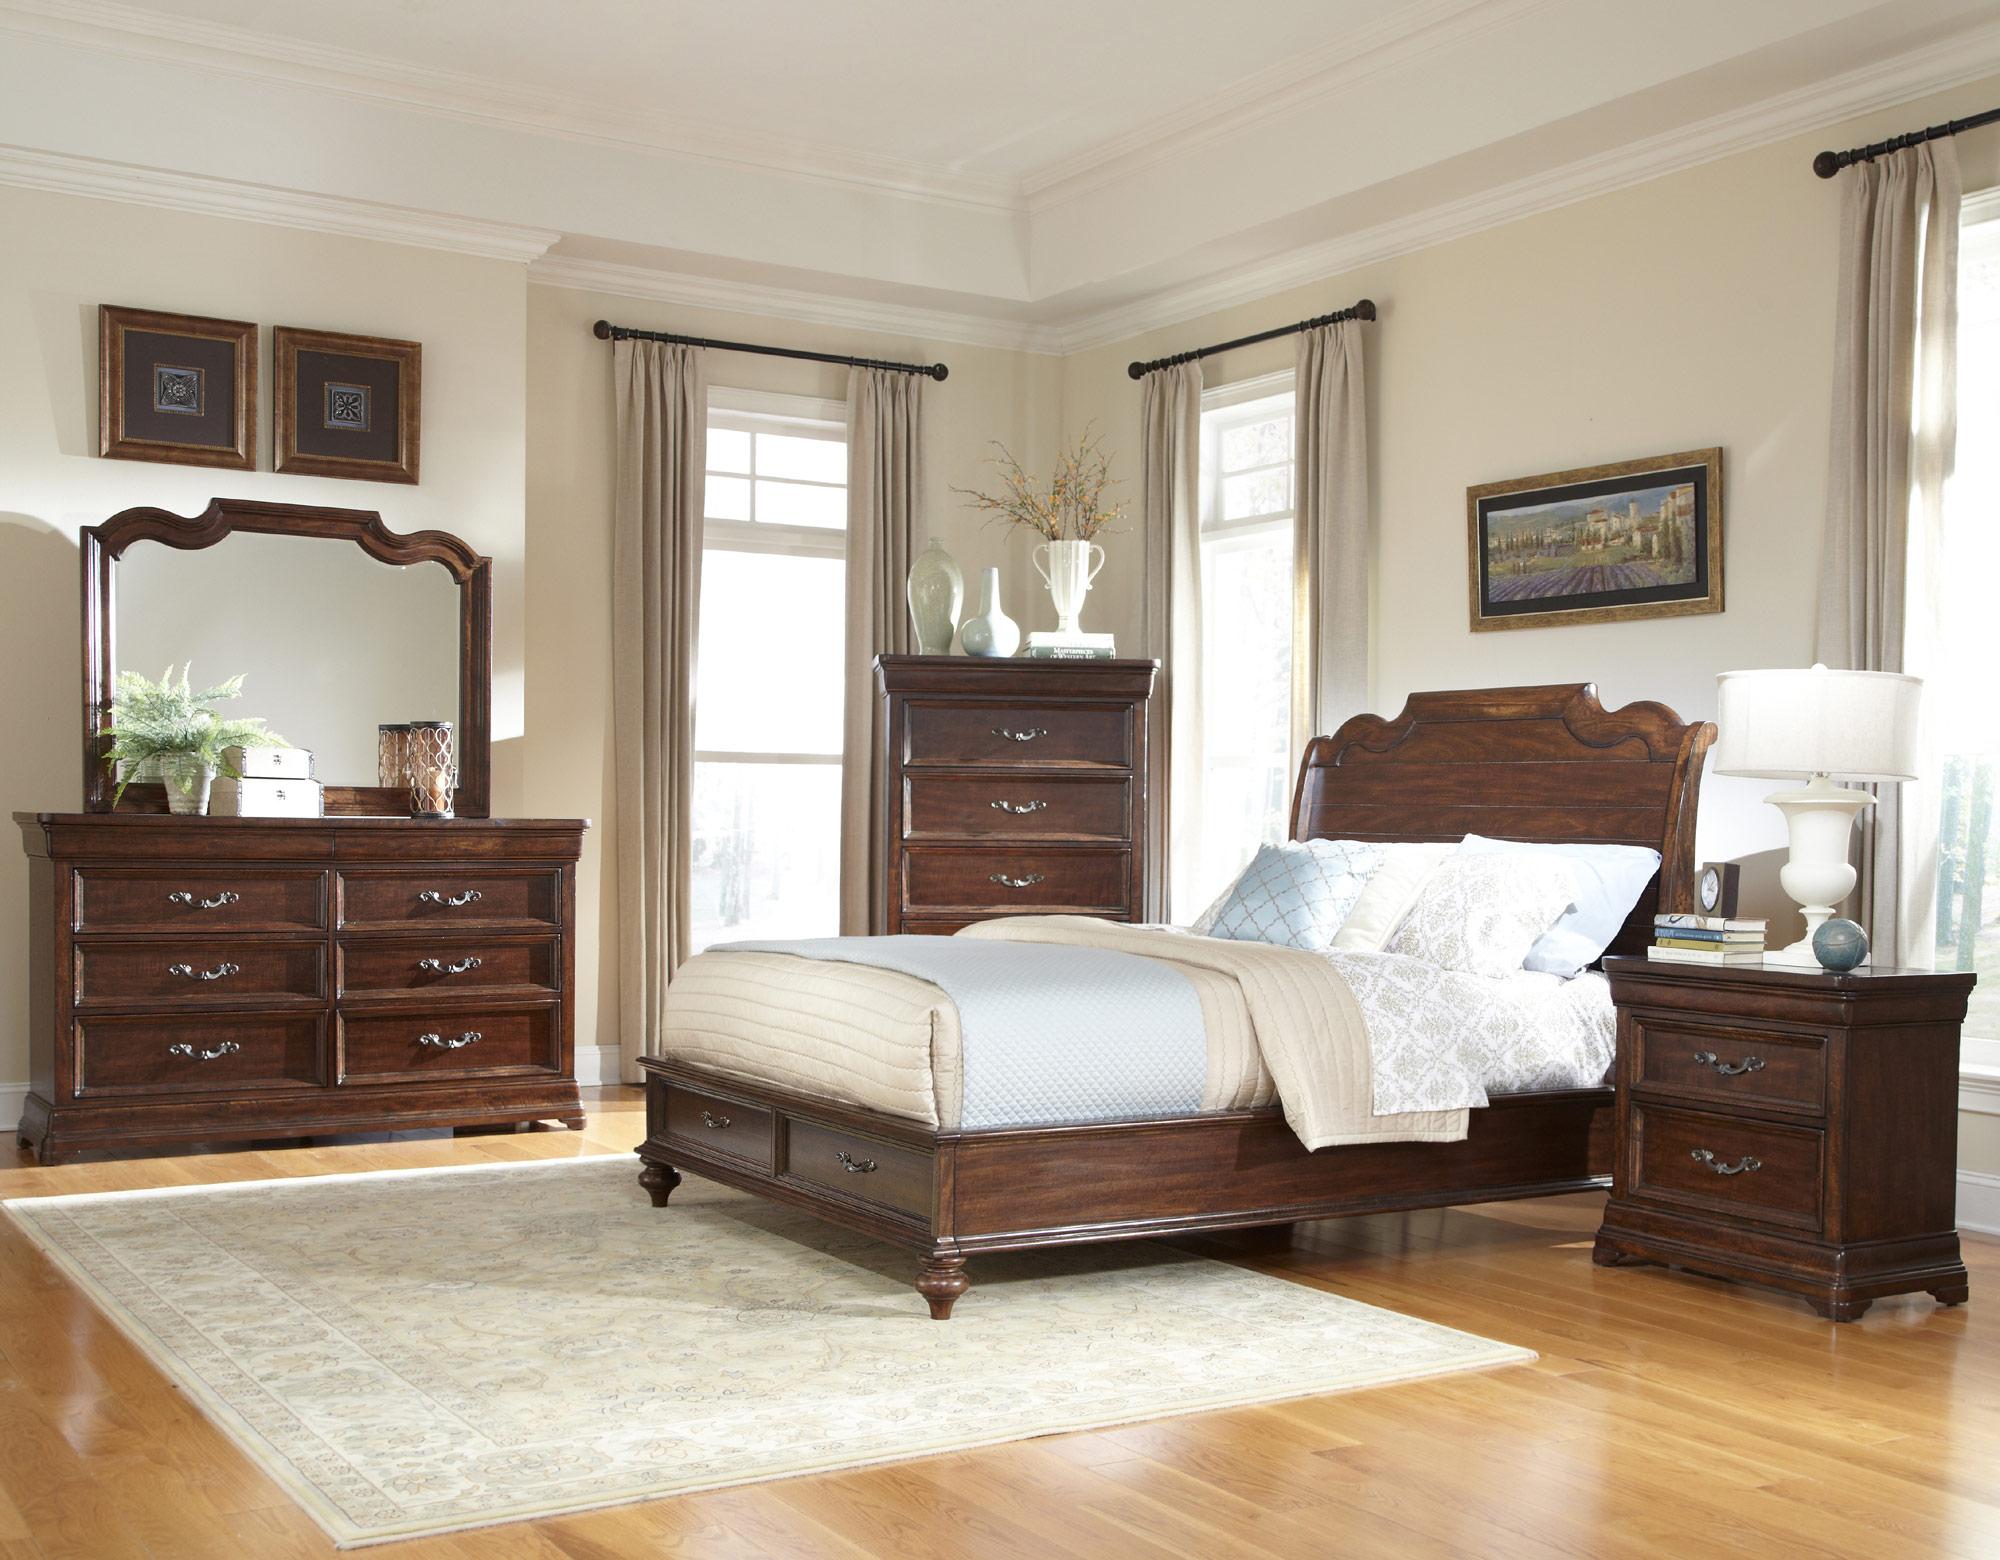 Signature King Sleigh Storage Bedroom Set   American ...